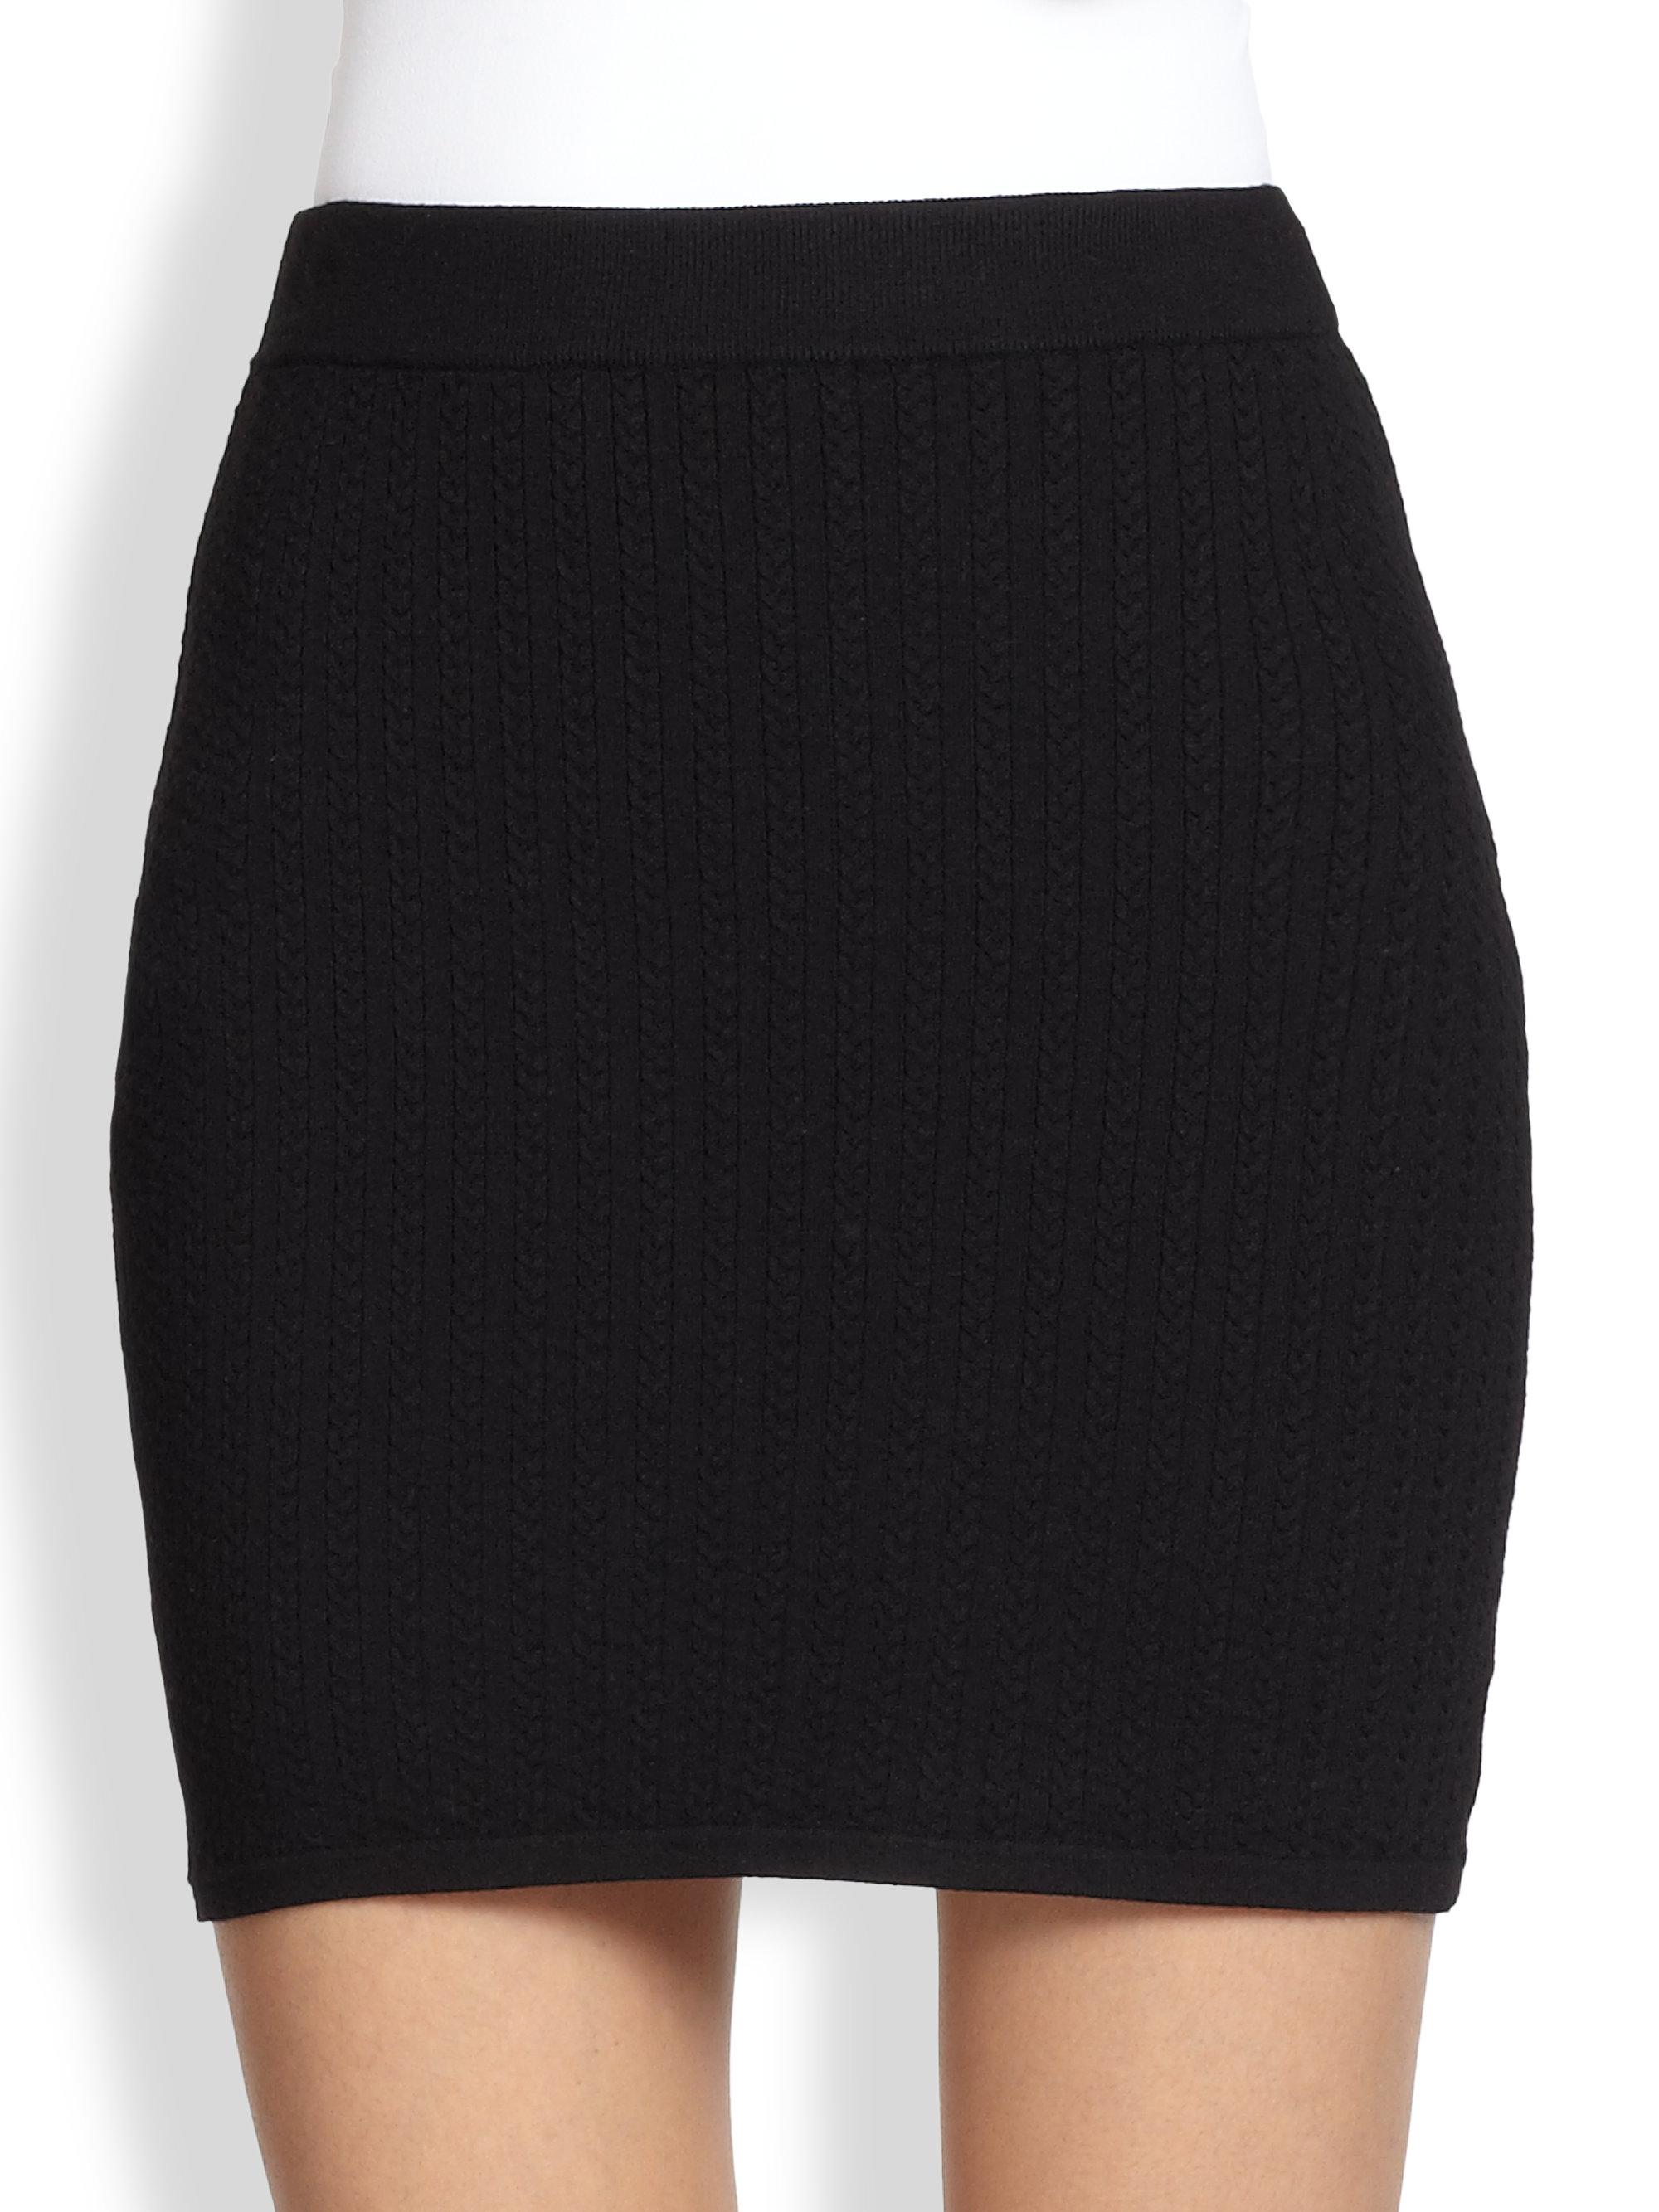 Rag & bone Lyla Ribbed Cableknit Mini Skirt in Black | Lyst